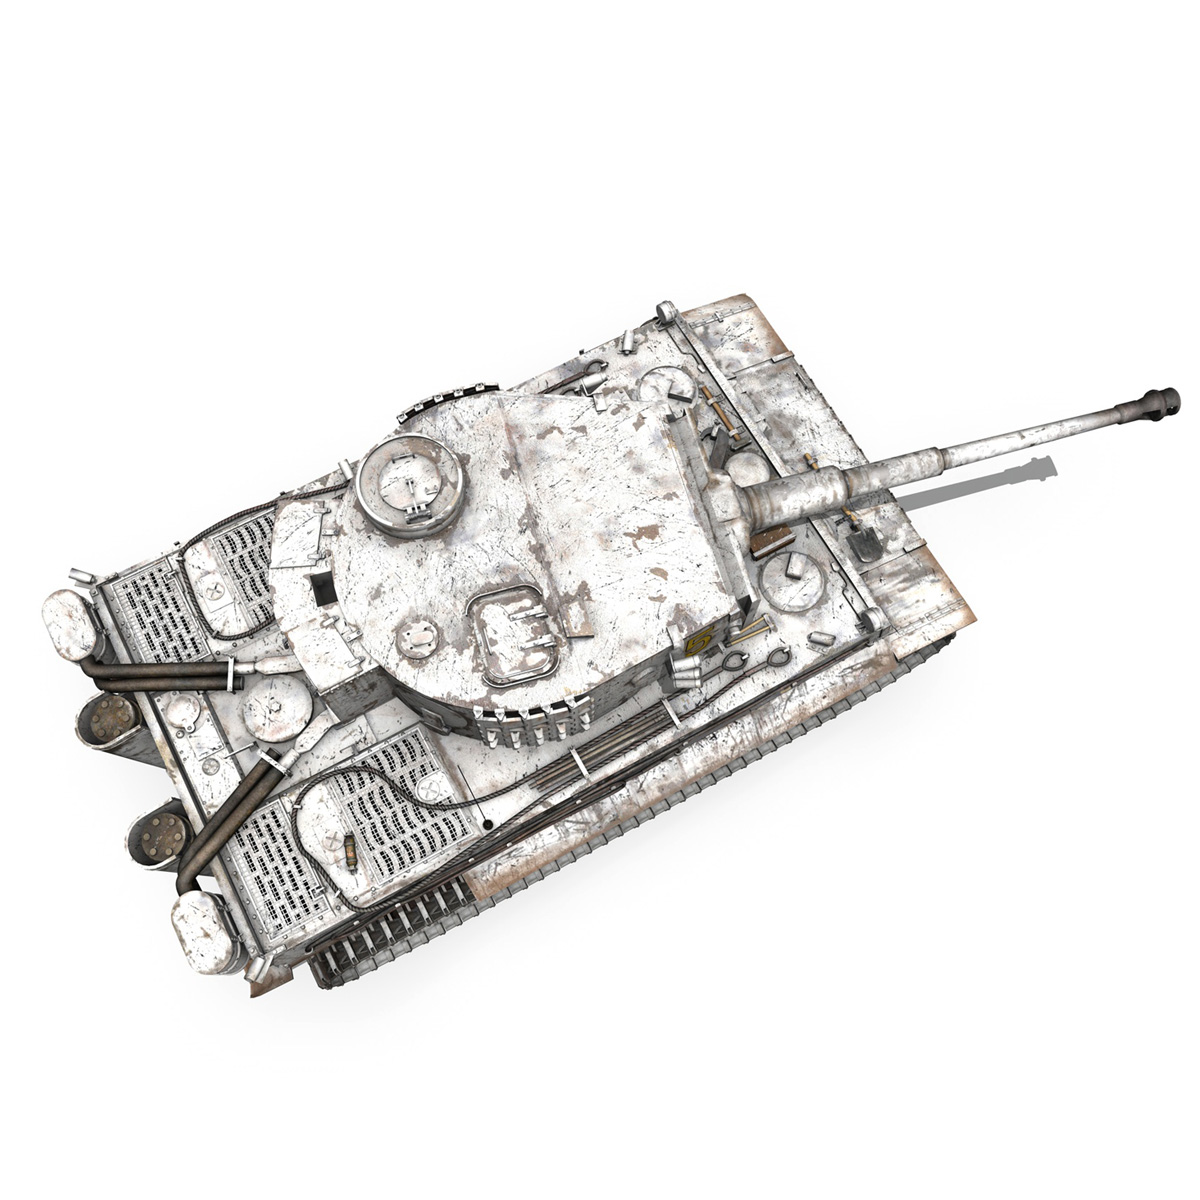 panzer vi – tiger – 5 – early production 3d model 3ds c4d lwo obj 279359